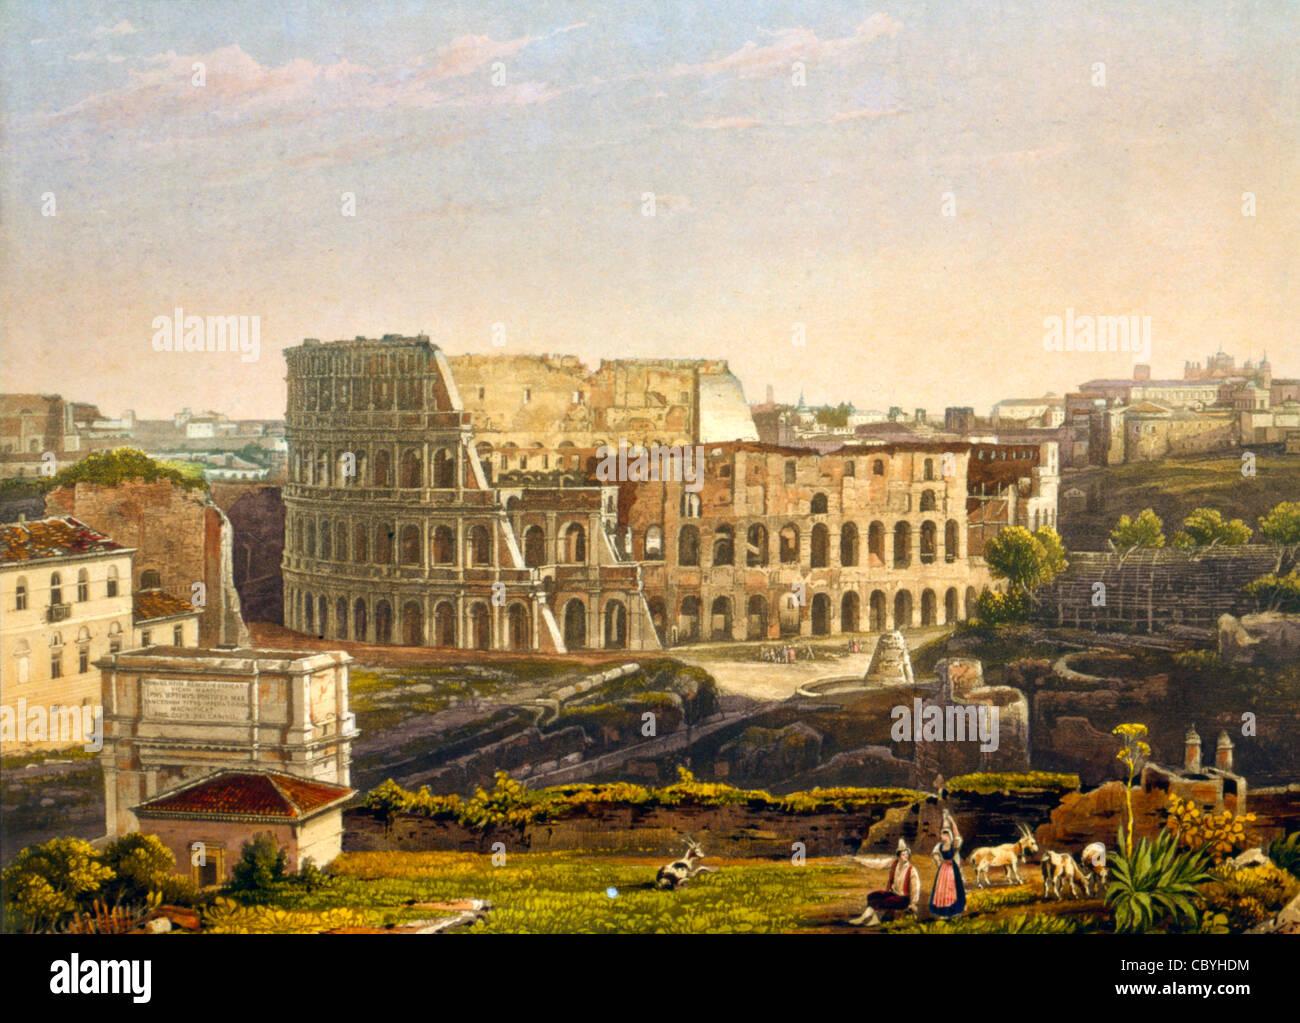 Blick auf das Kolosseum, Rom, Italien. Le Colisee ein Rom! Ca. 1842 Stockfoto